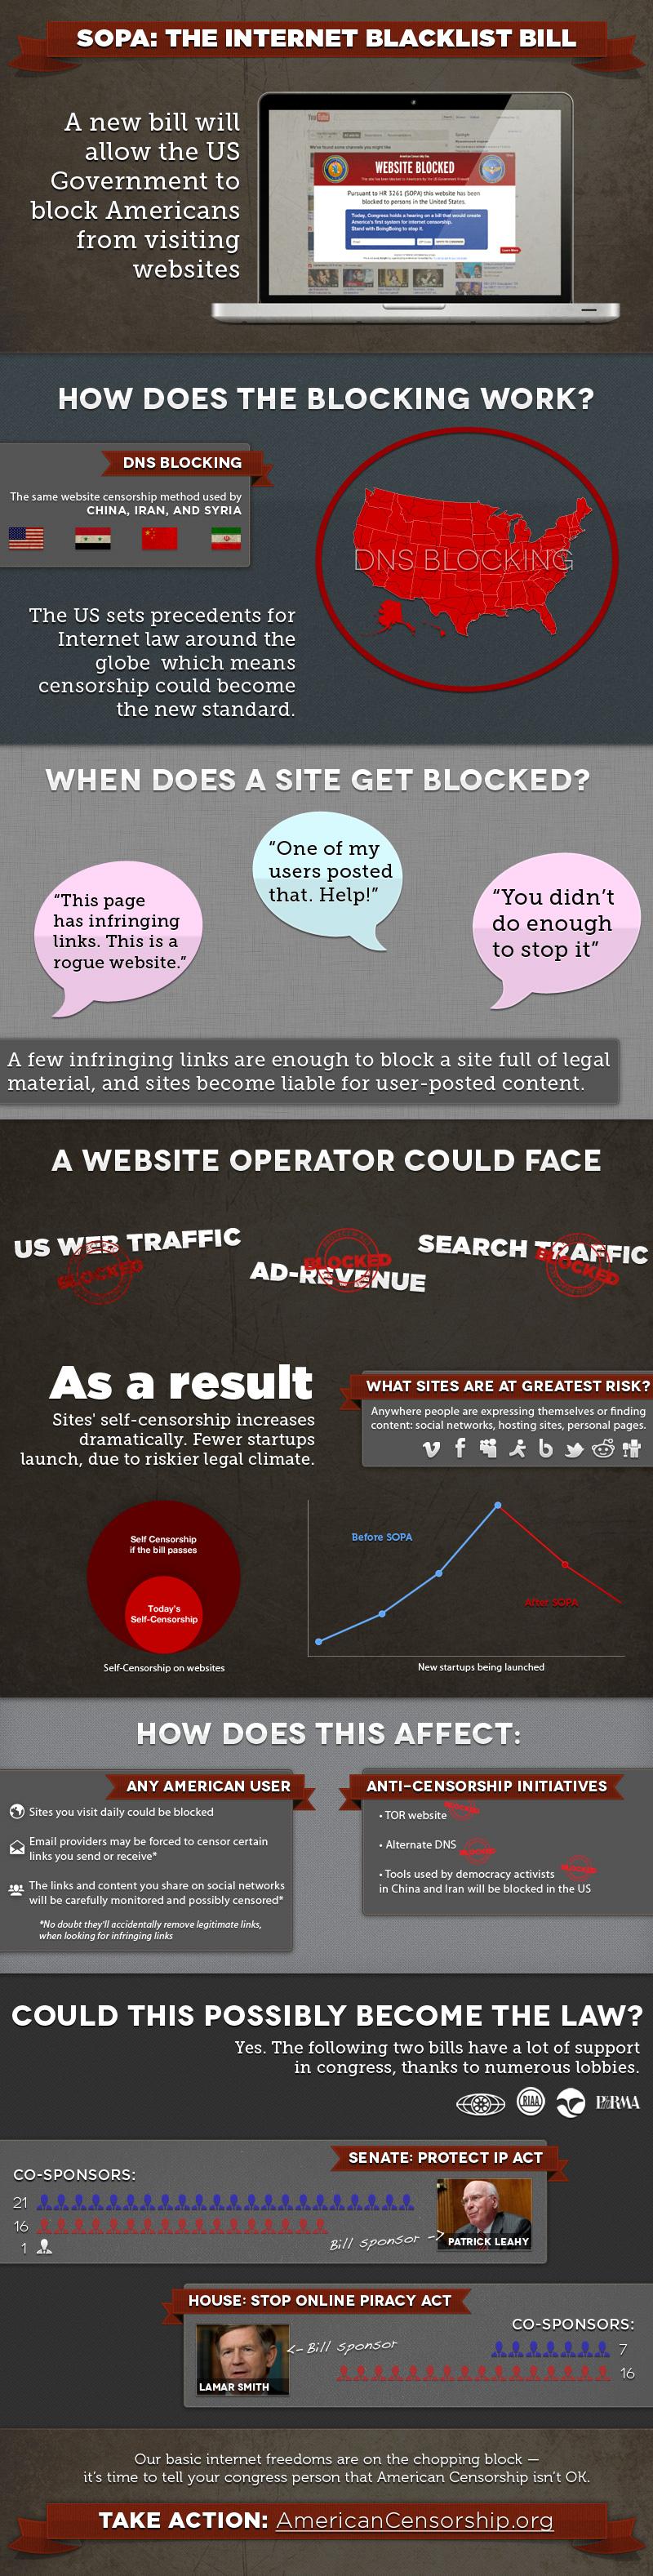 SOPA Infographic